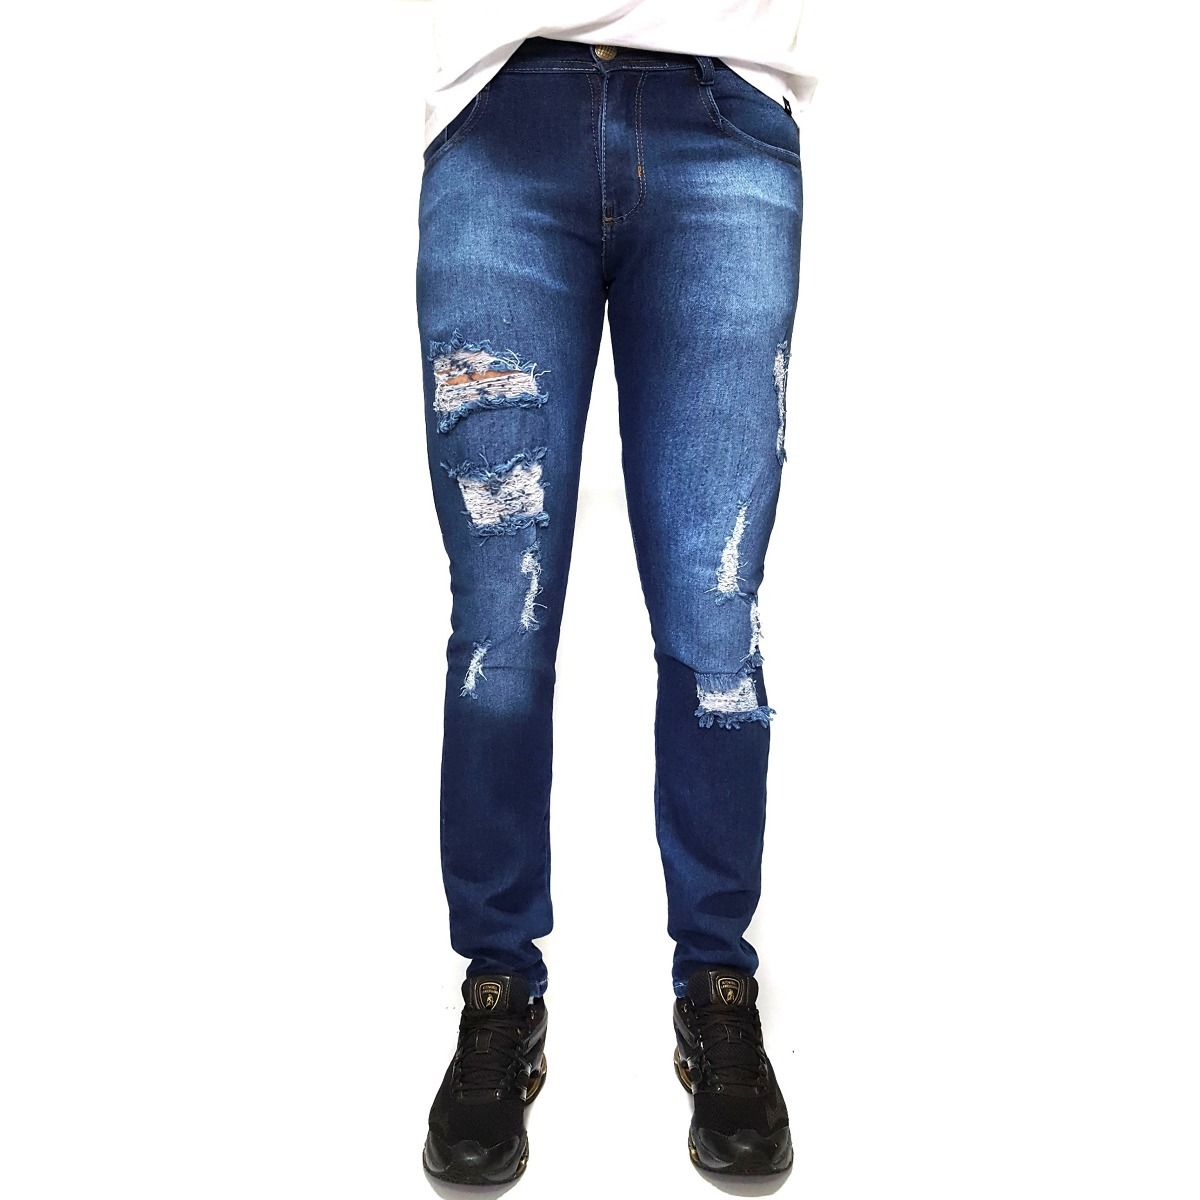 calça masculina destroyed jeans skinny lycra premium ballad. Carregando  zoom. cdcdd996bf14f